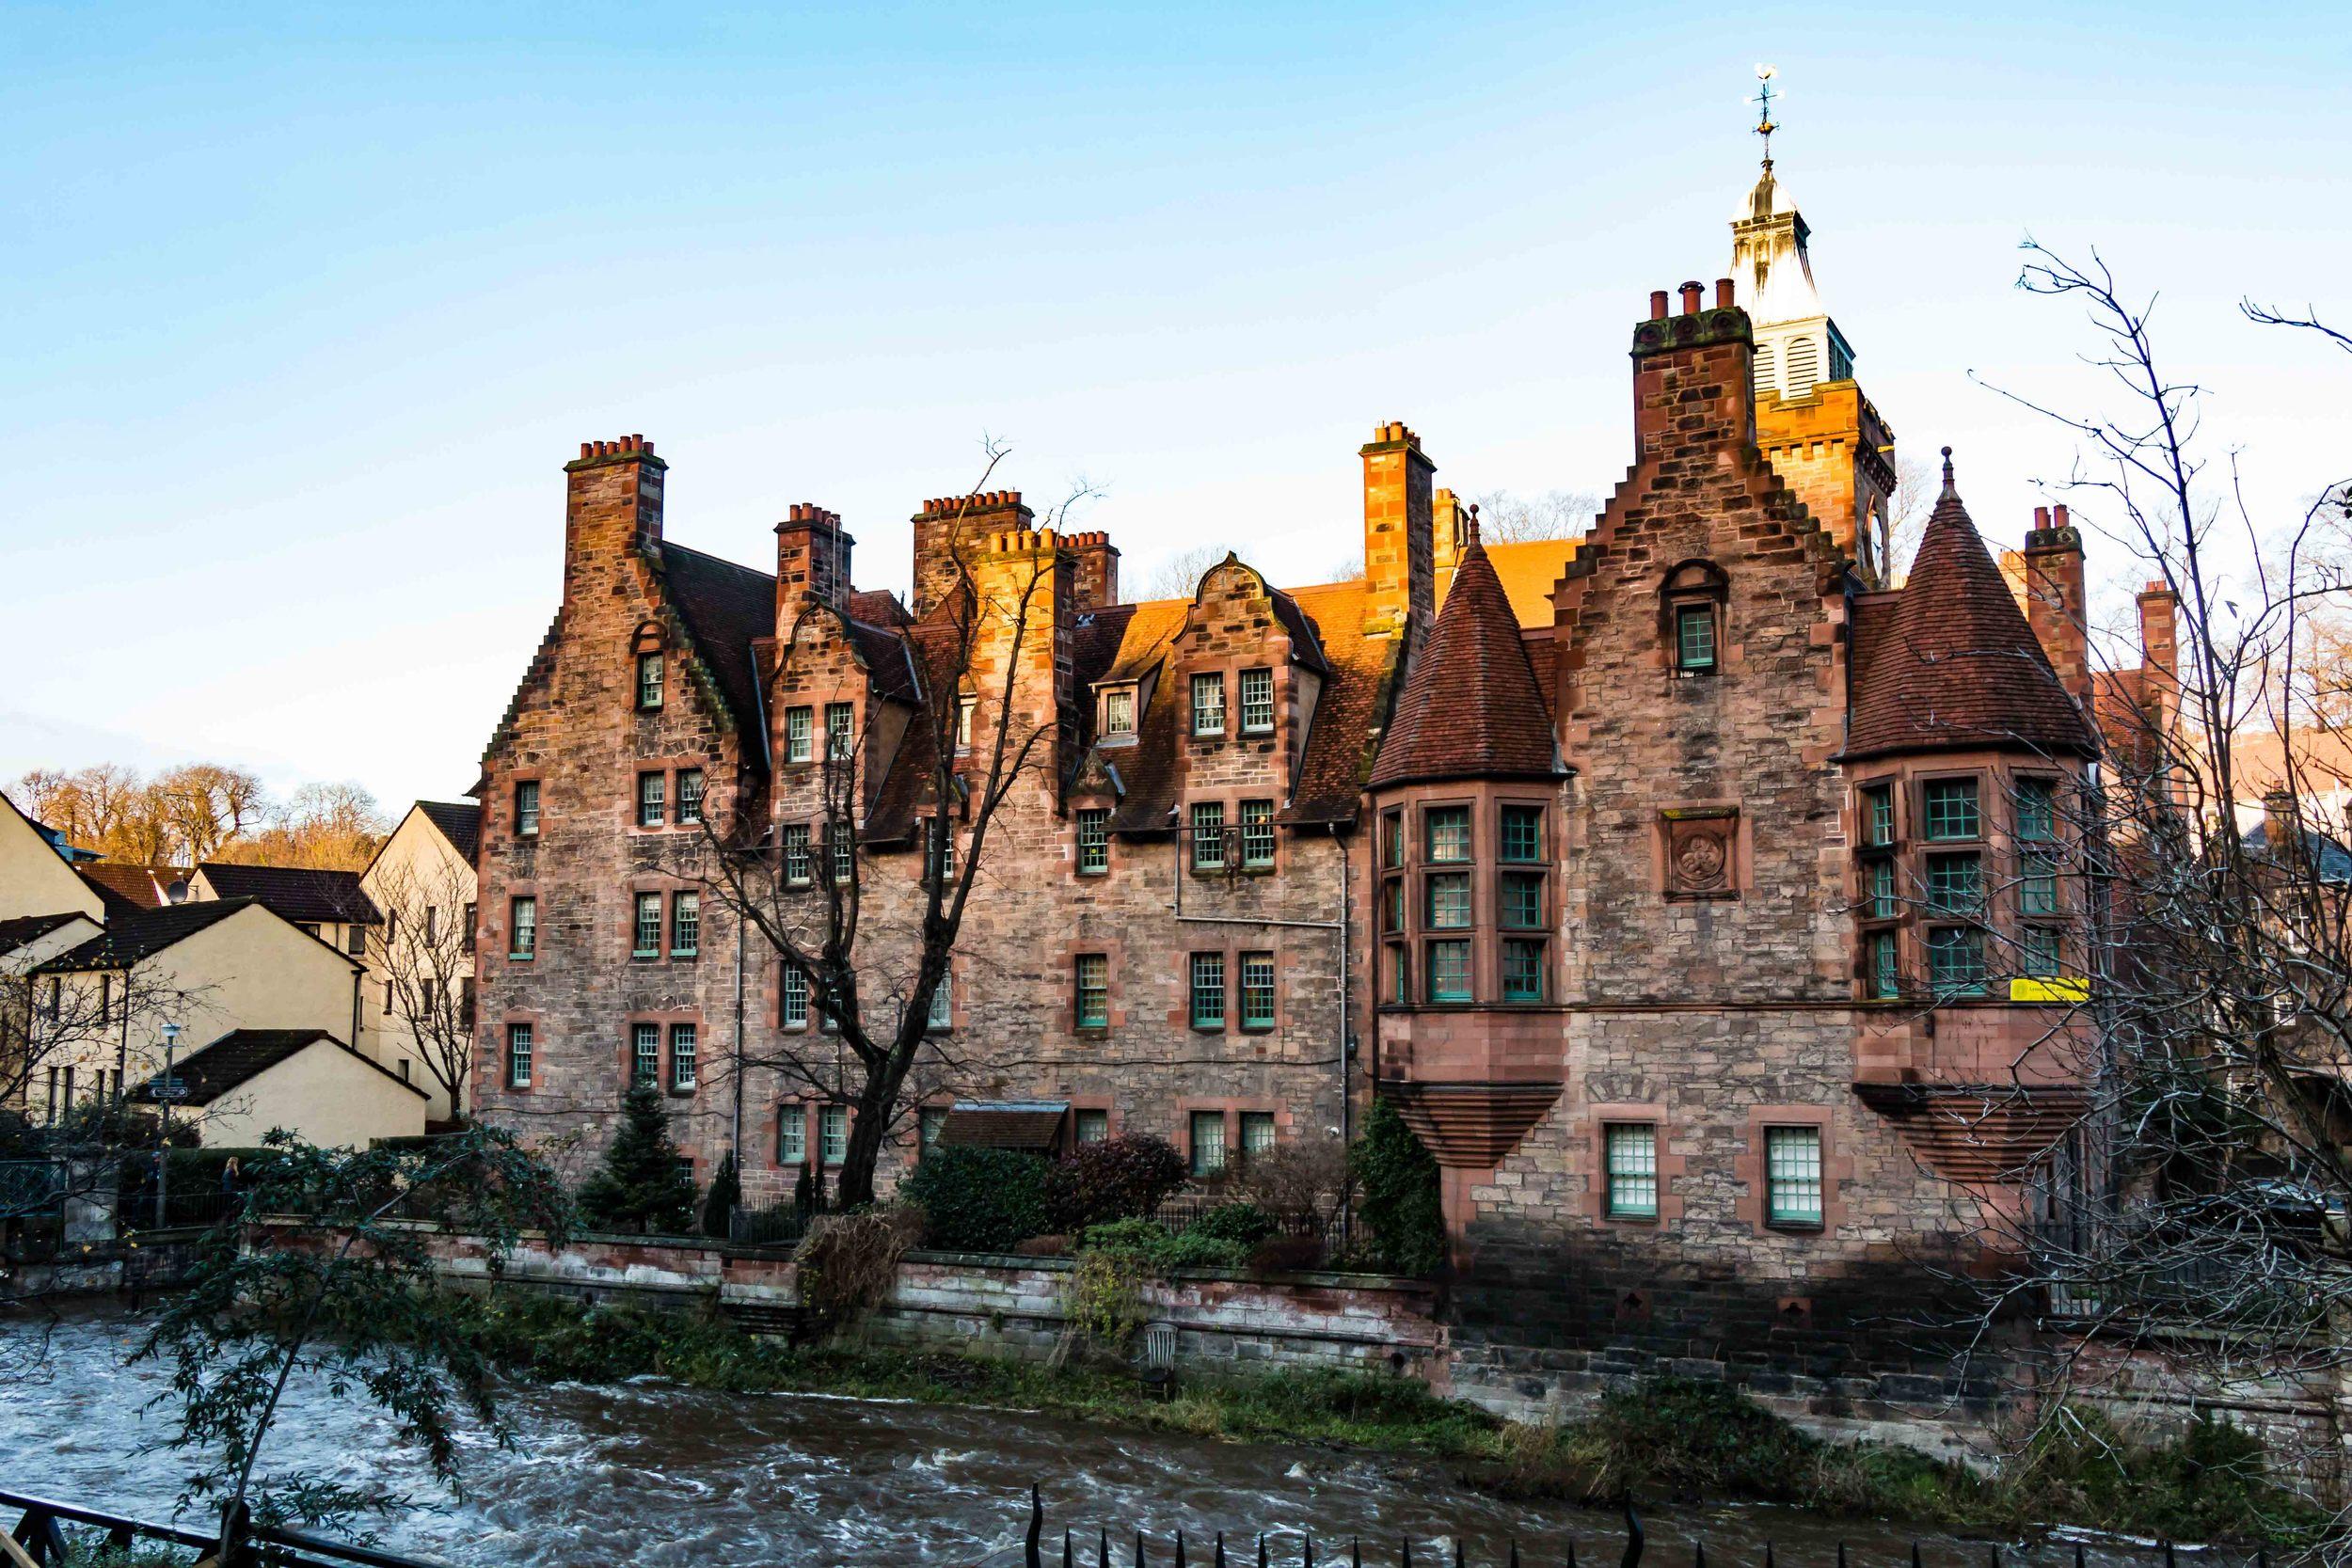 SOA_Edinburgh-Scotland-deans-village.jpg